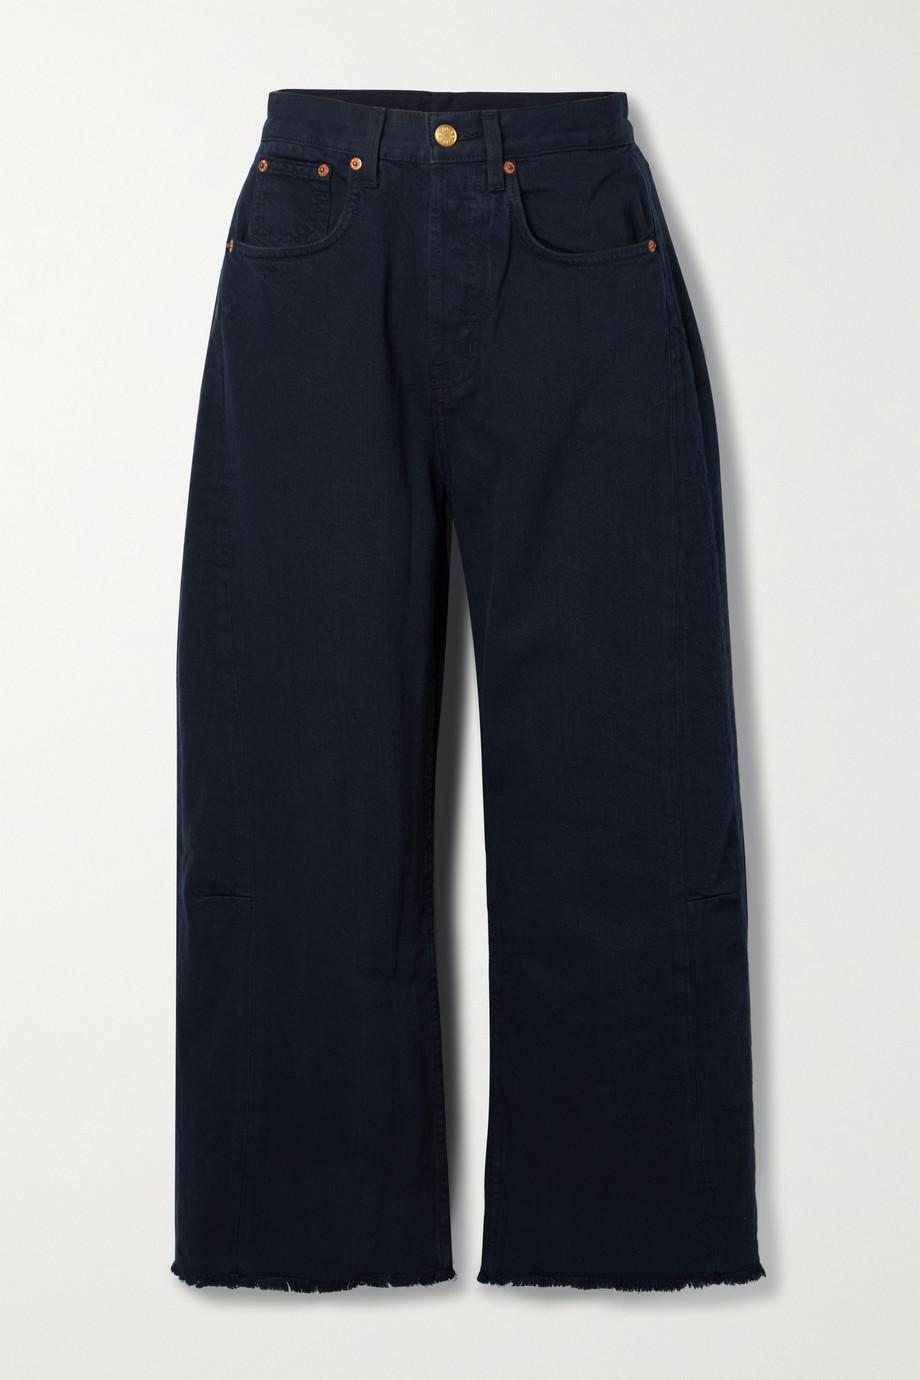 B Sides Jean large taille haute Lasso